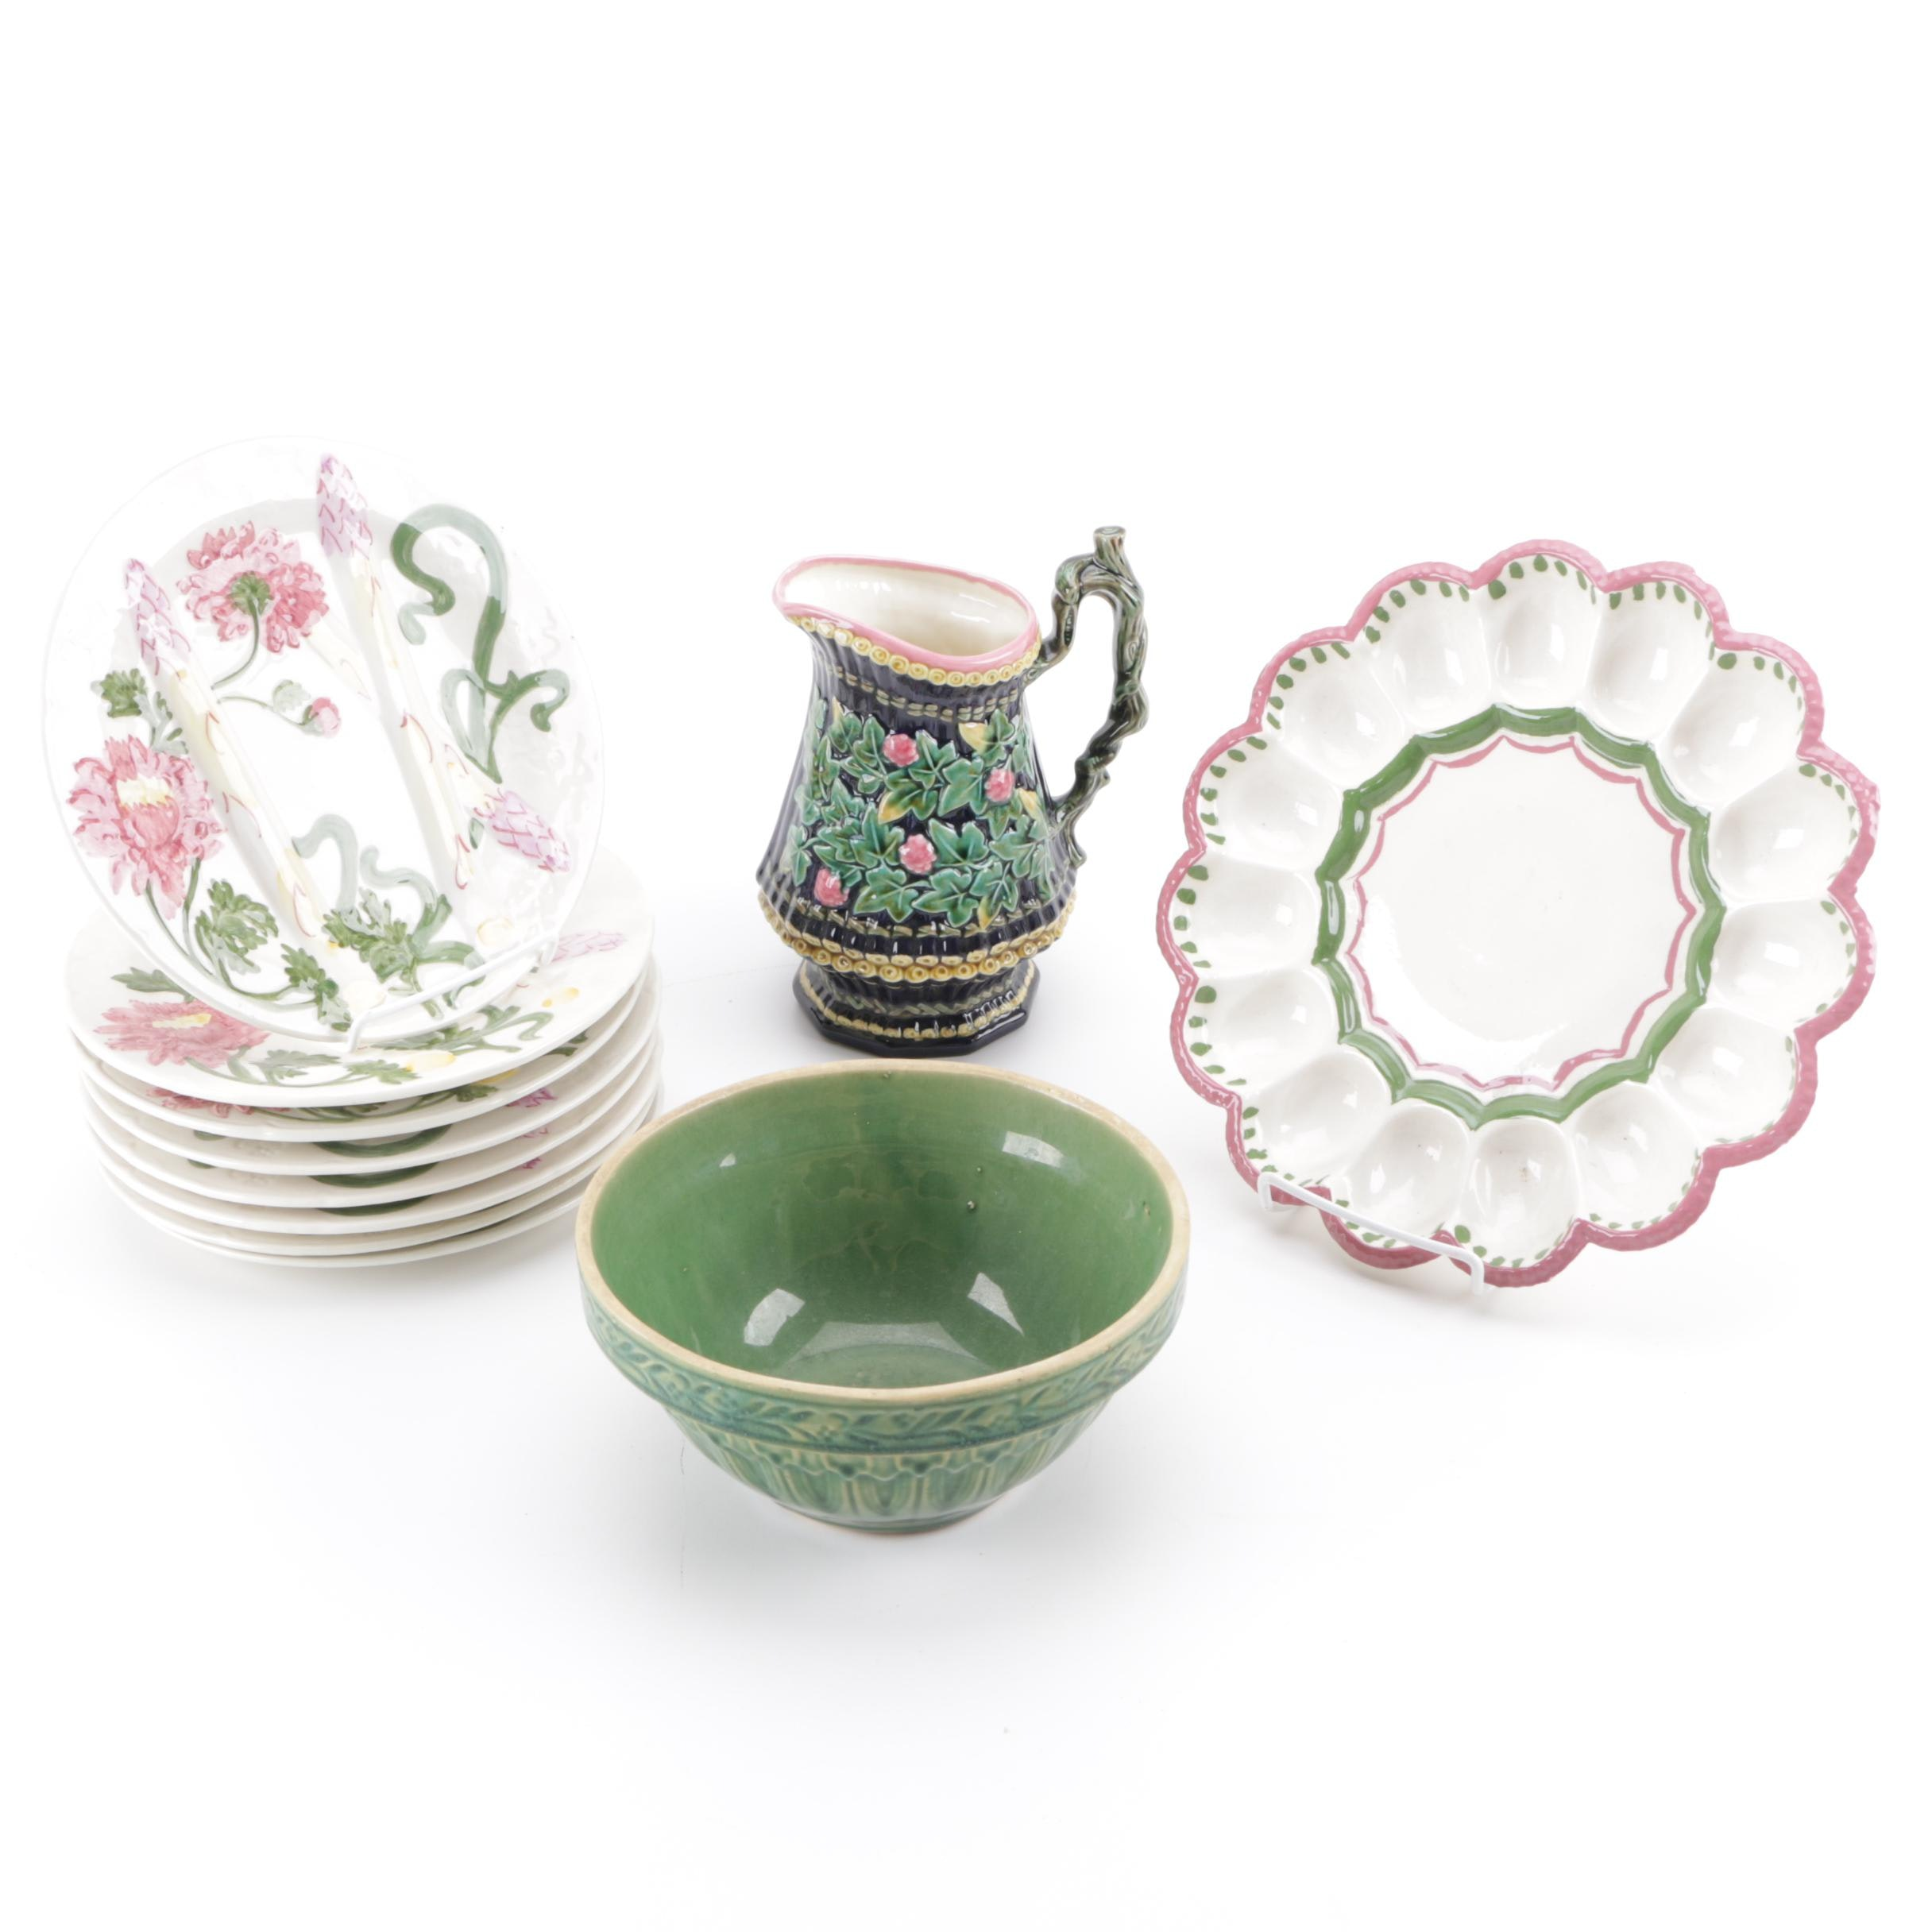 Assortment of Tableware